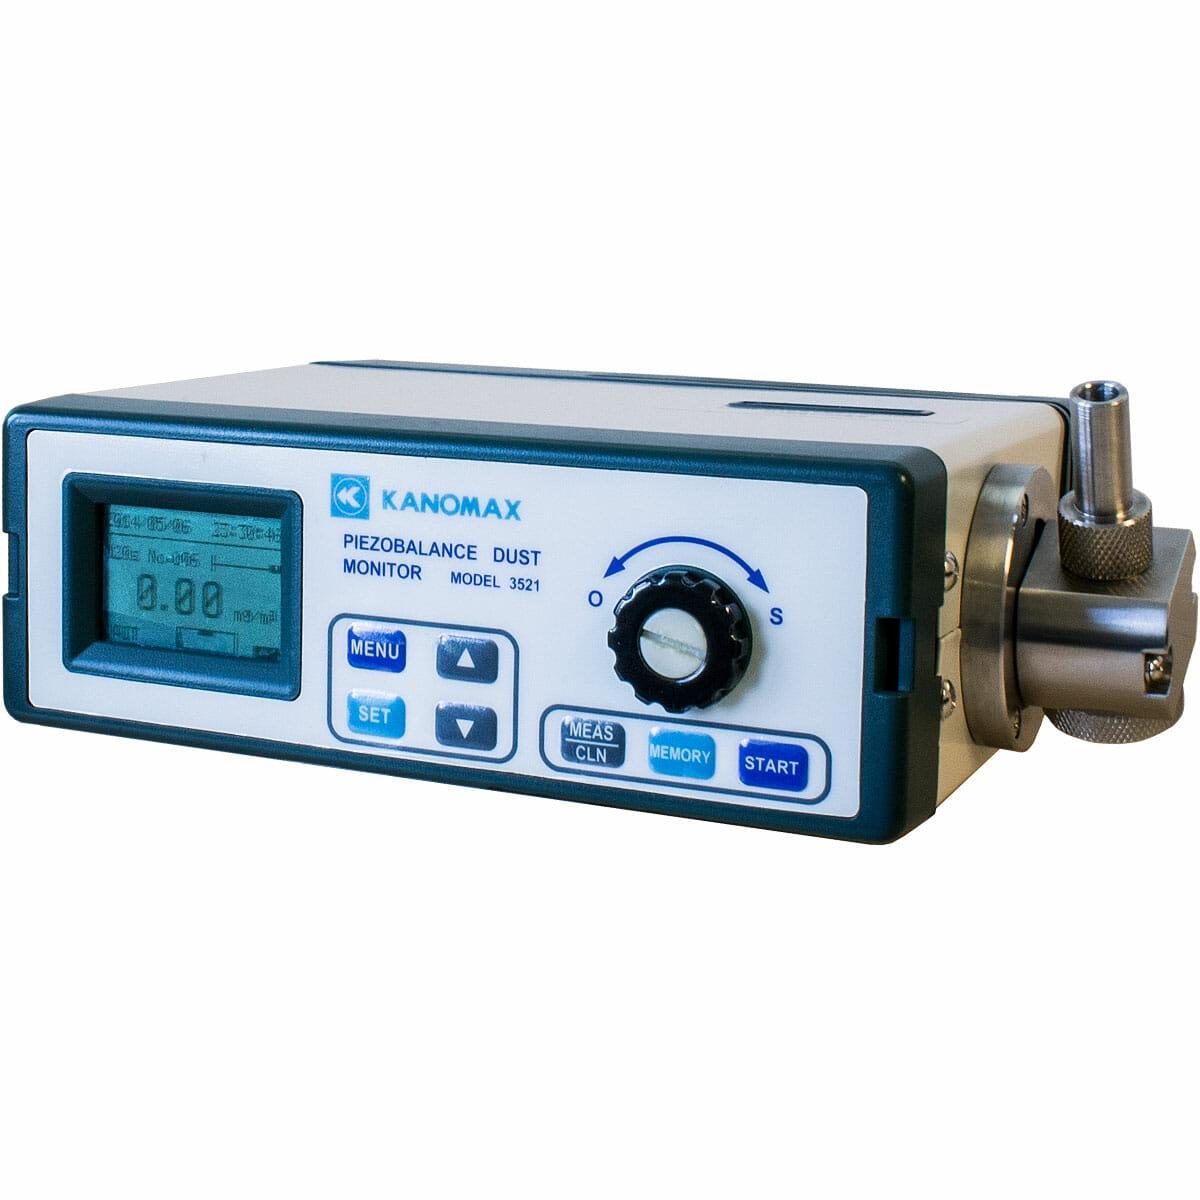 Piezobalance Dust Monitor - 3520 Series